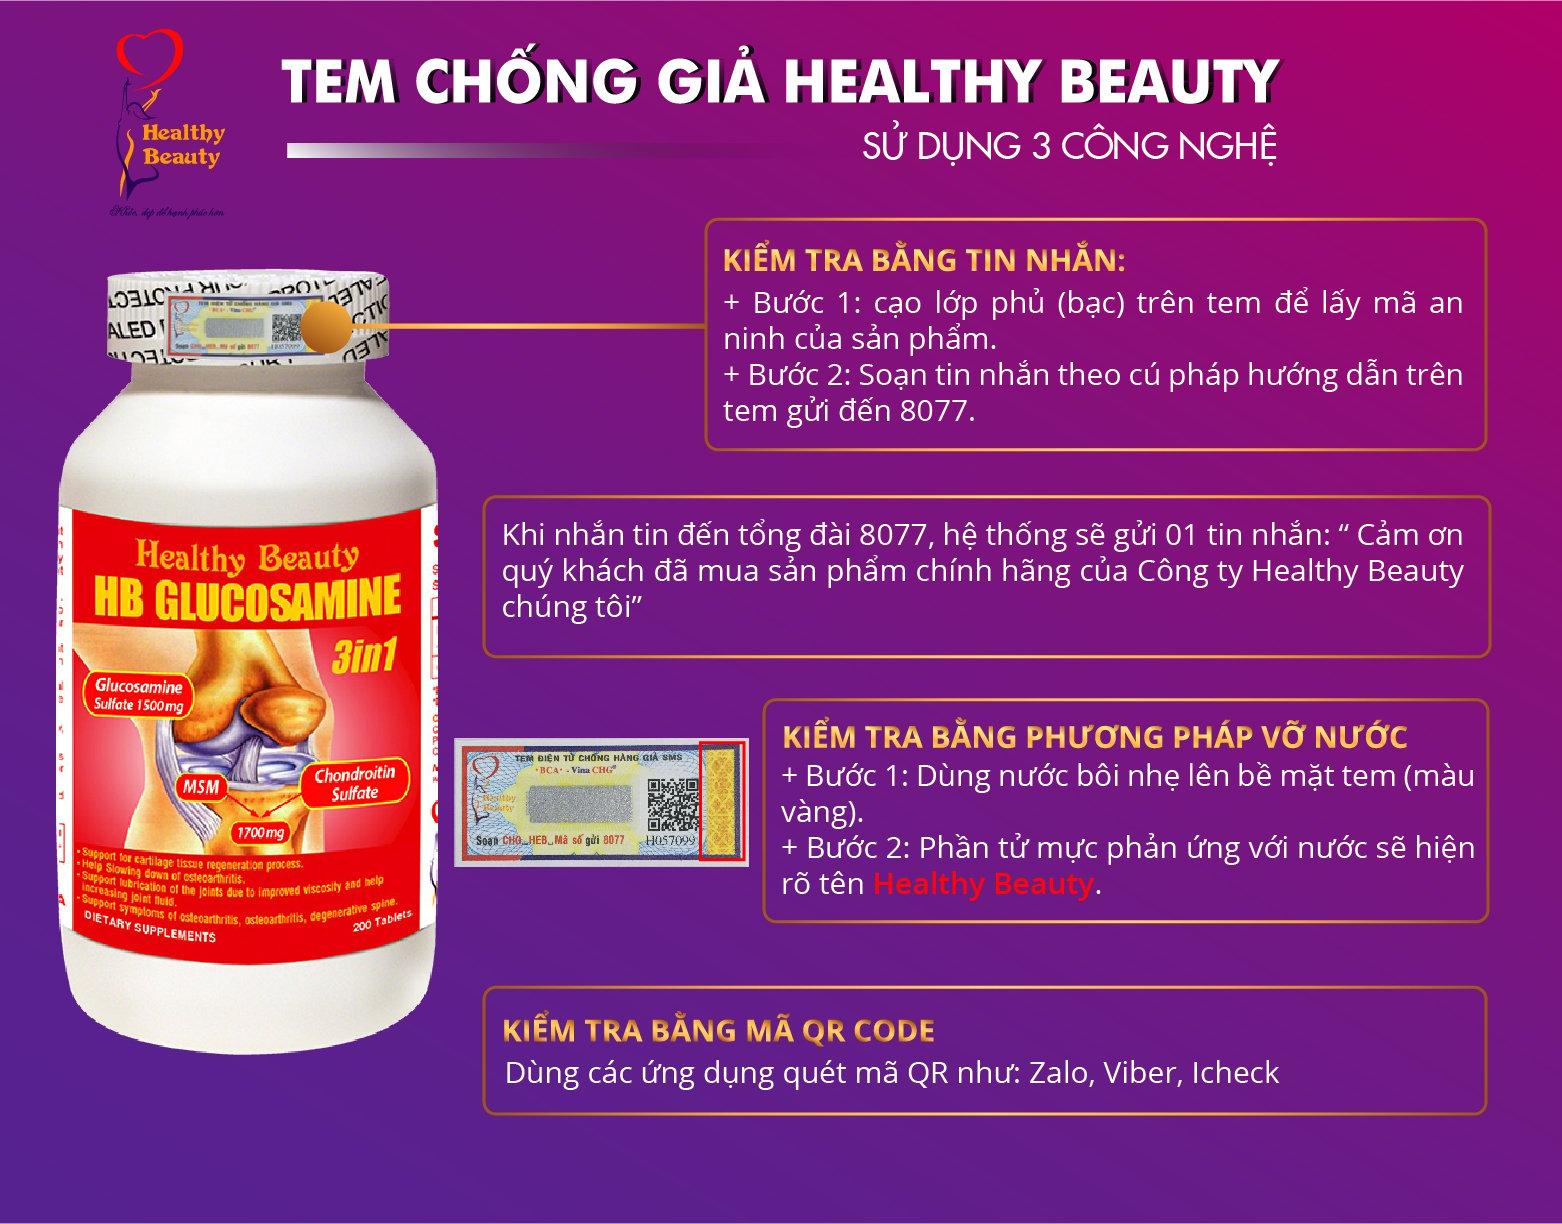 Hướng dẫn sử dụng tem chống giả Healthy Beauty HB Glucosamine 3 in 1